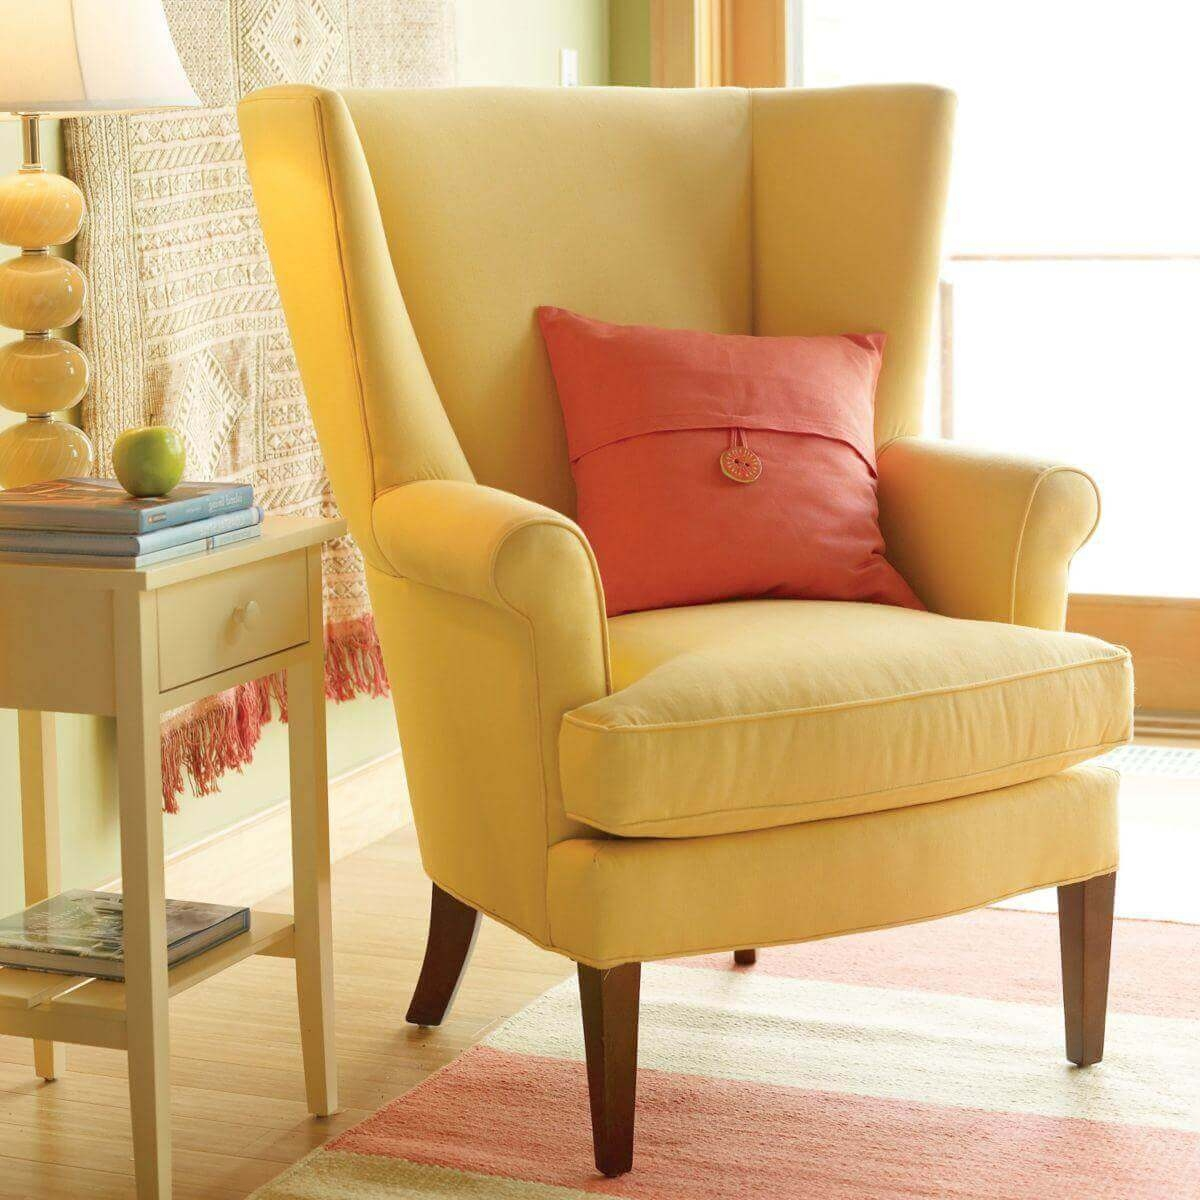 Attirant Yellow Wingback Chair